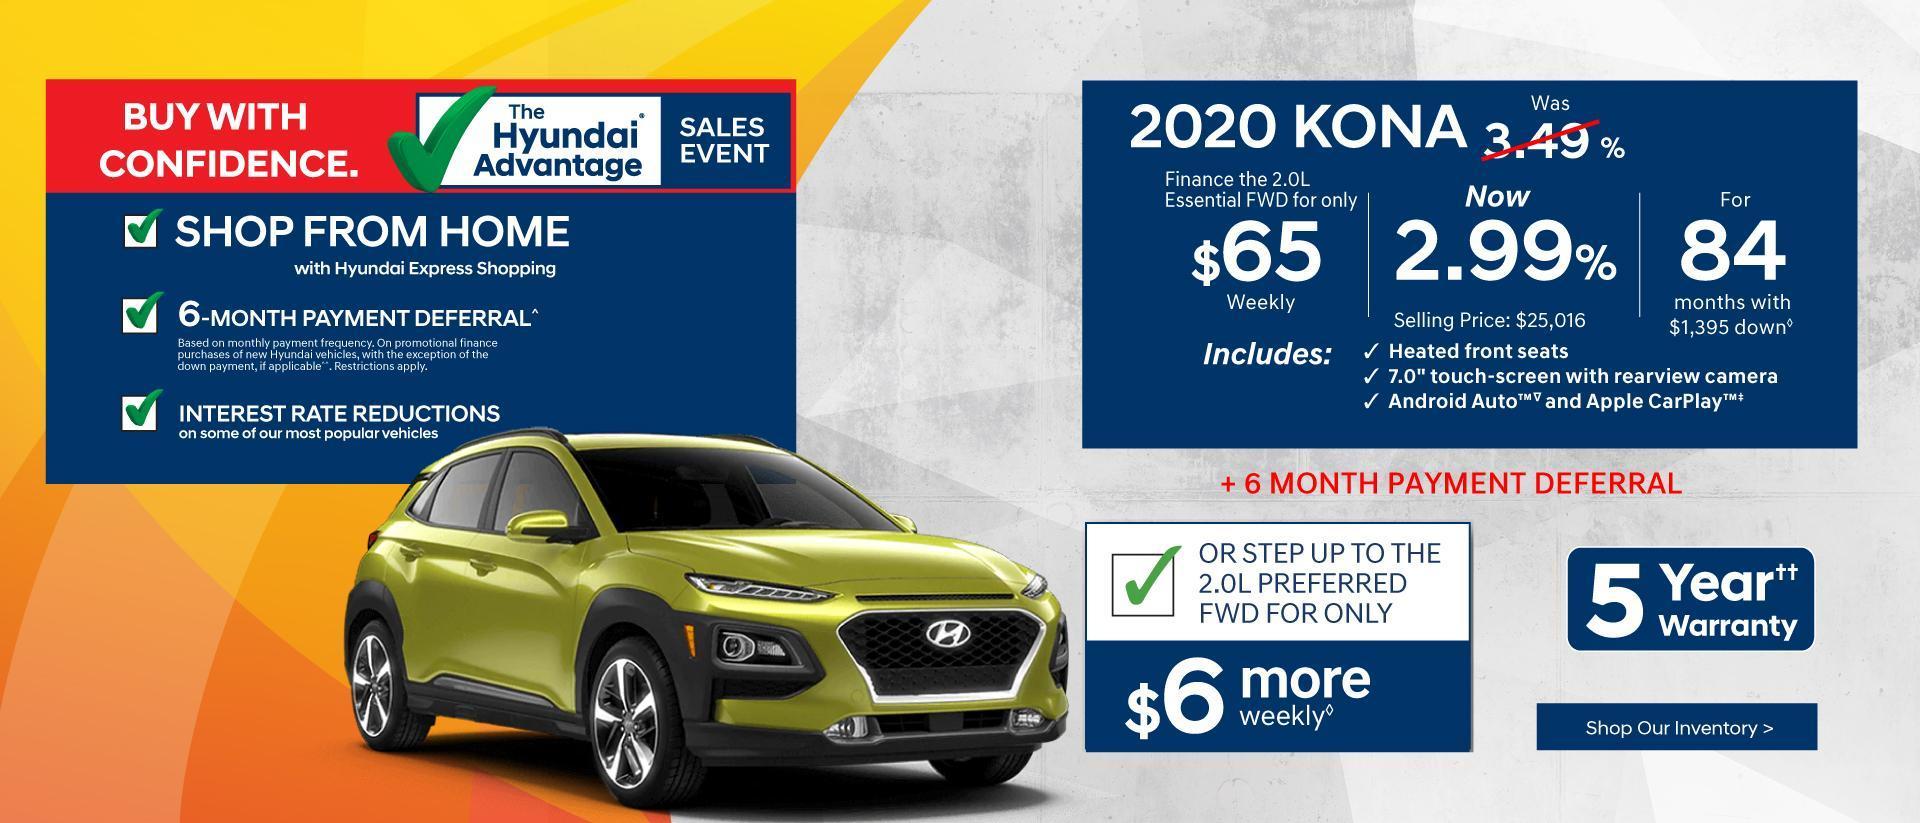 Shop From Home with Hyundai Express Shopping | 2020 Hyundai Kona | Corey Hyundai